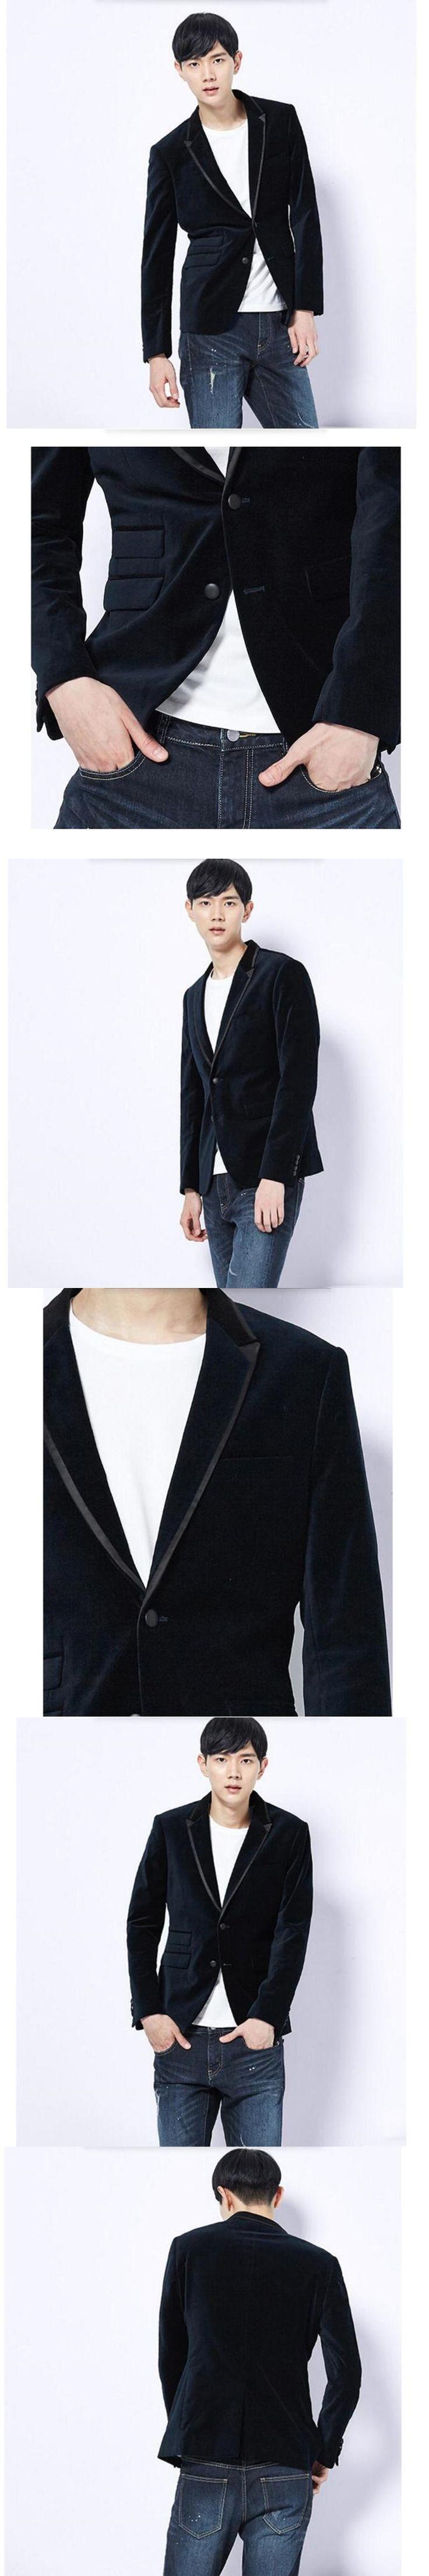 High quality men's suit jacket velvet classic style fashion groom suit jacket custom pure color single-breasted leisure men's ja